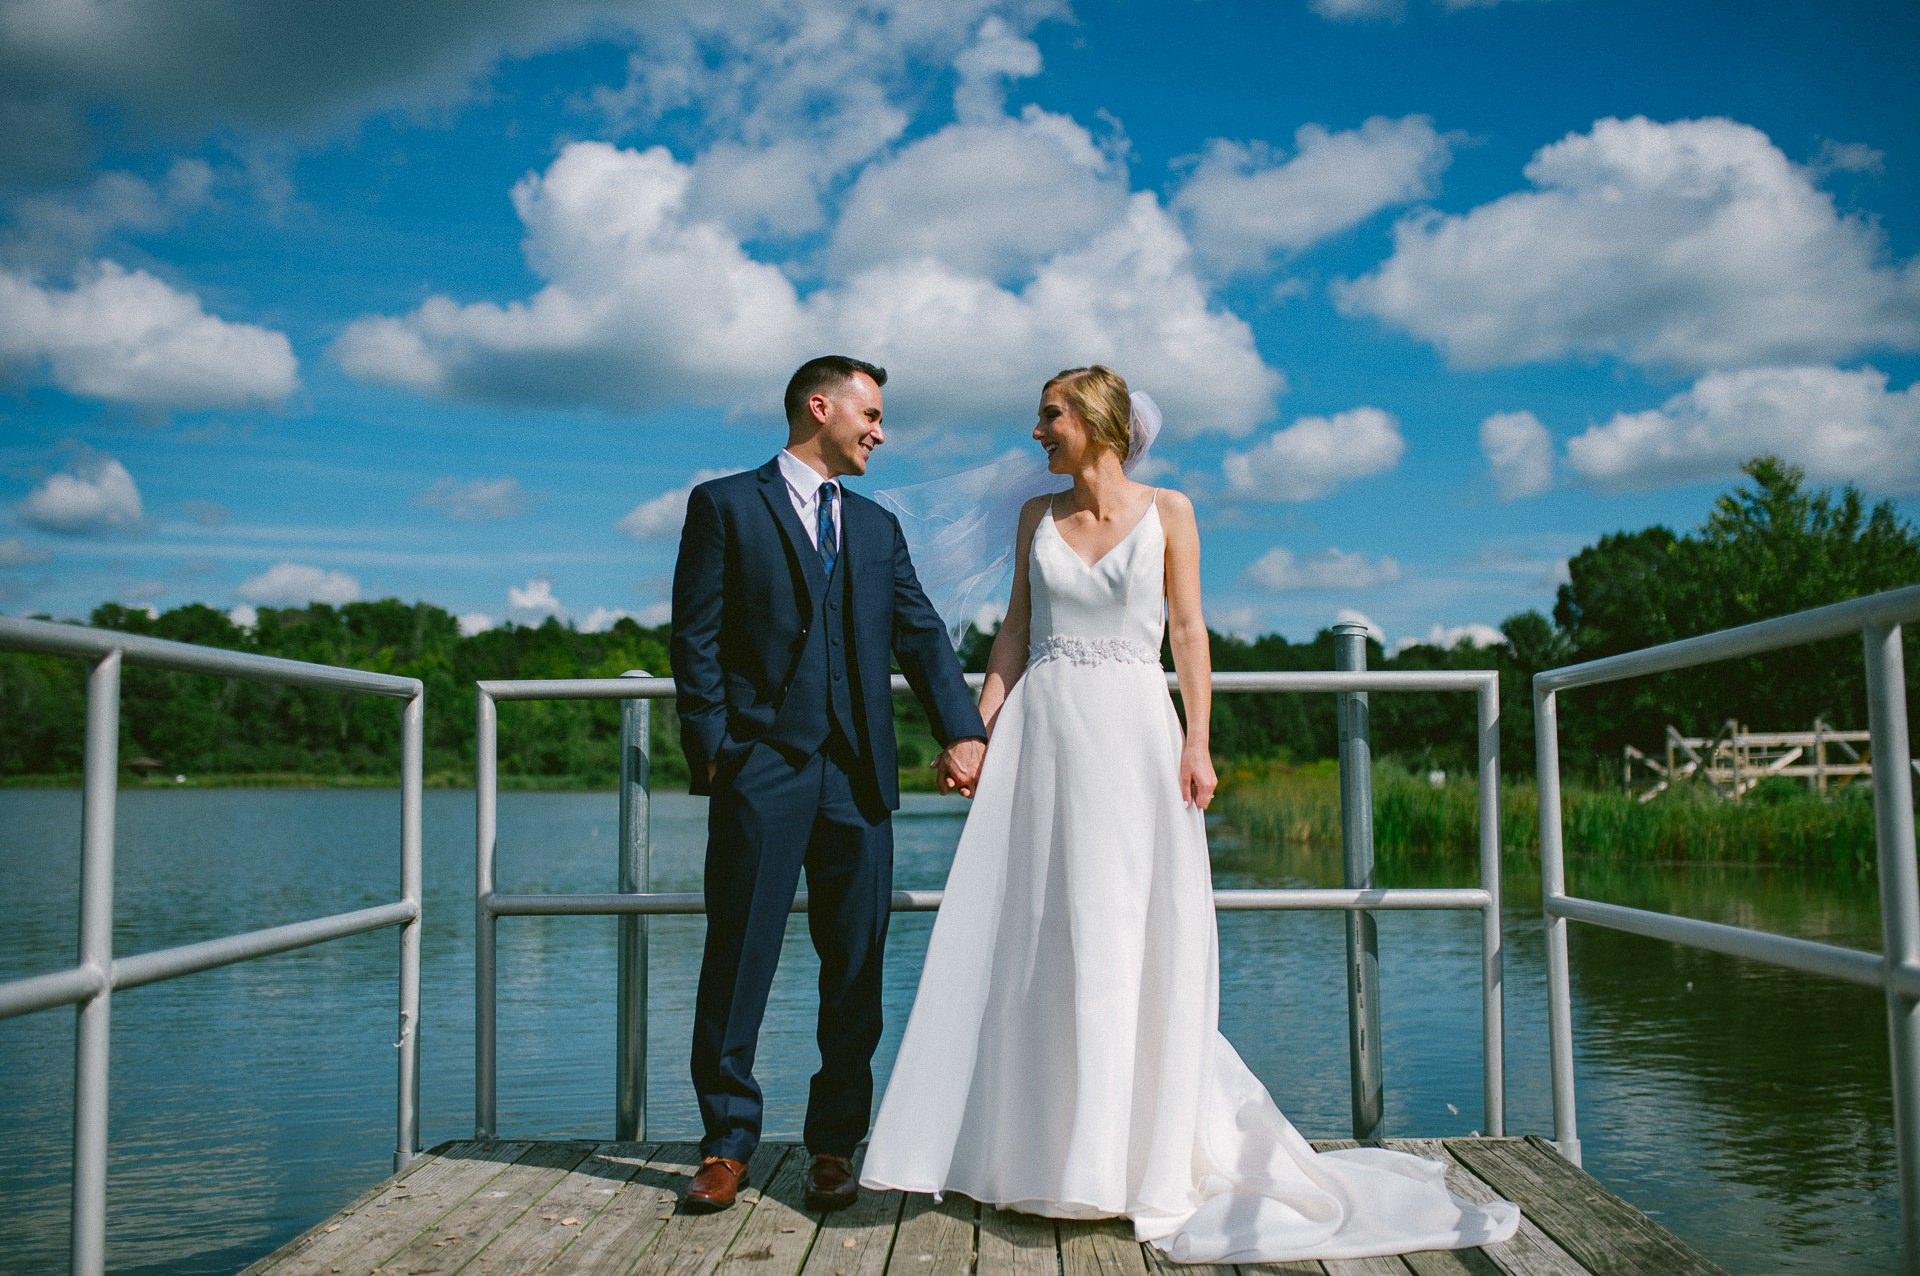 Bertram Inn Wedding Photographer in Aurora 1 29.jpg